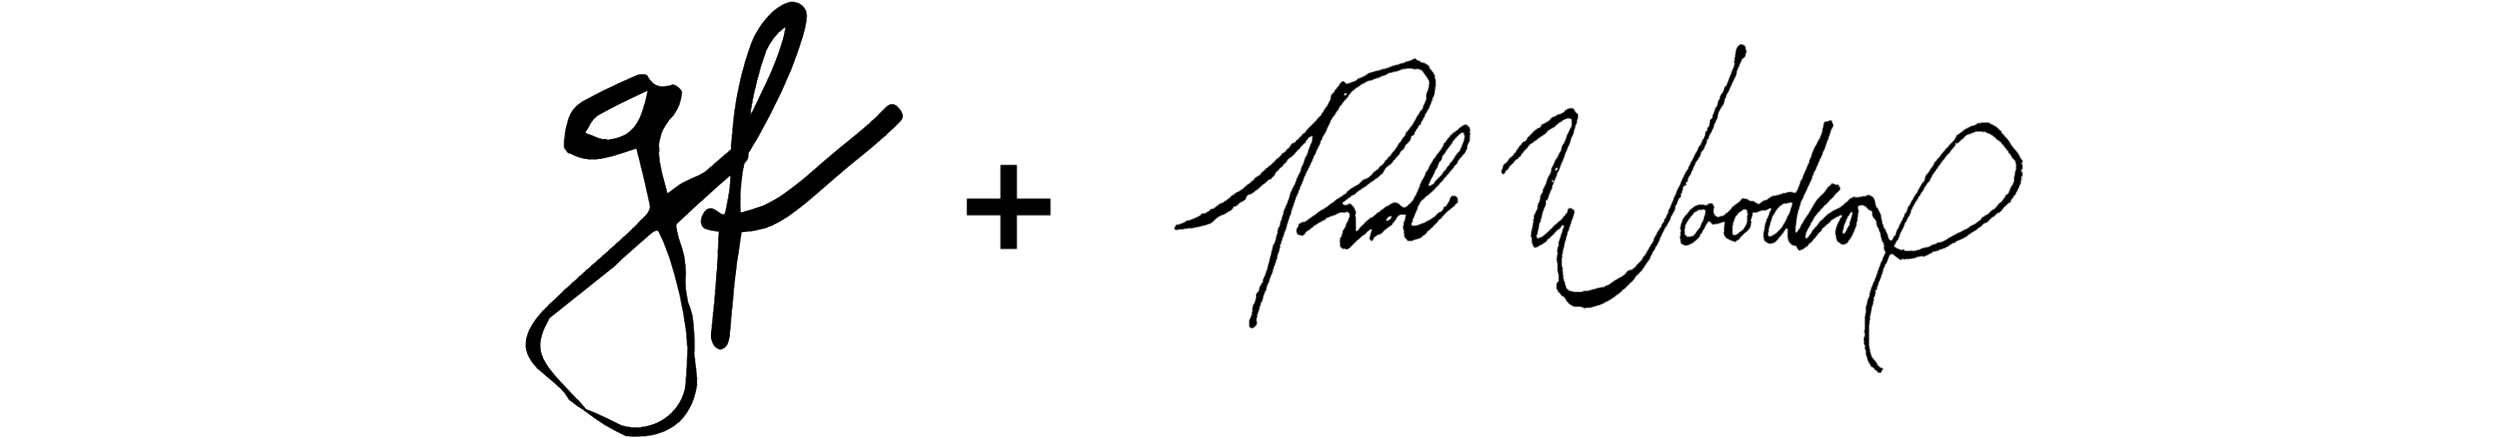 Gilded Fox + RW logos.png